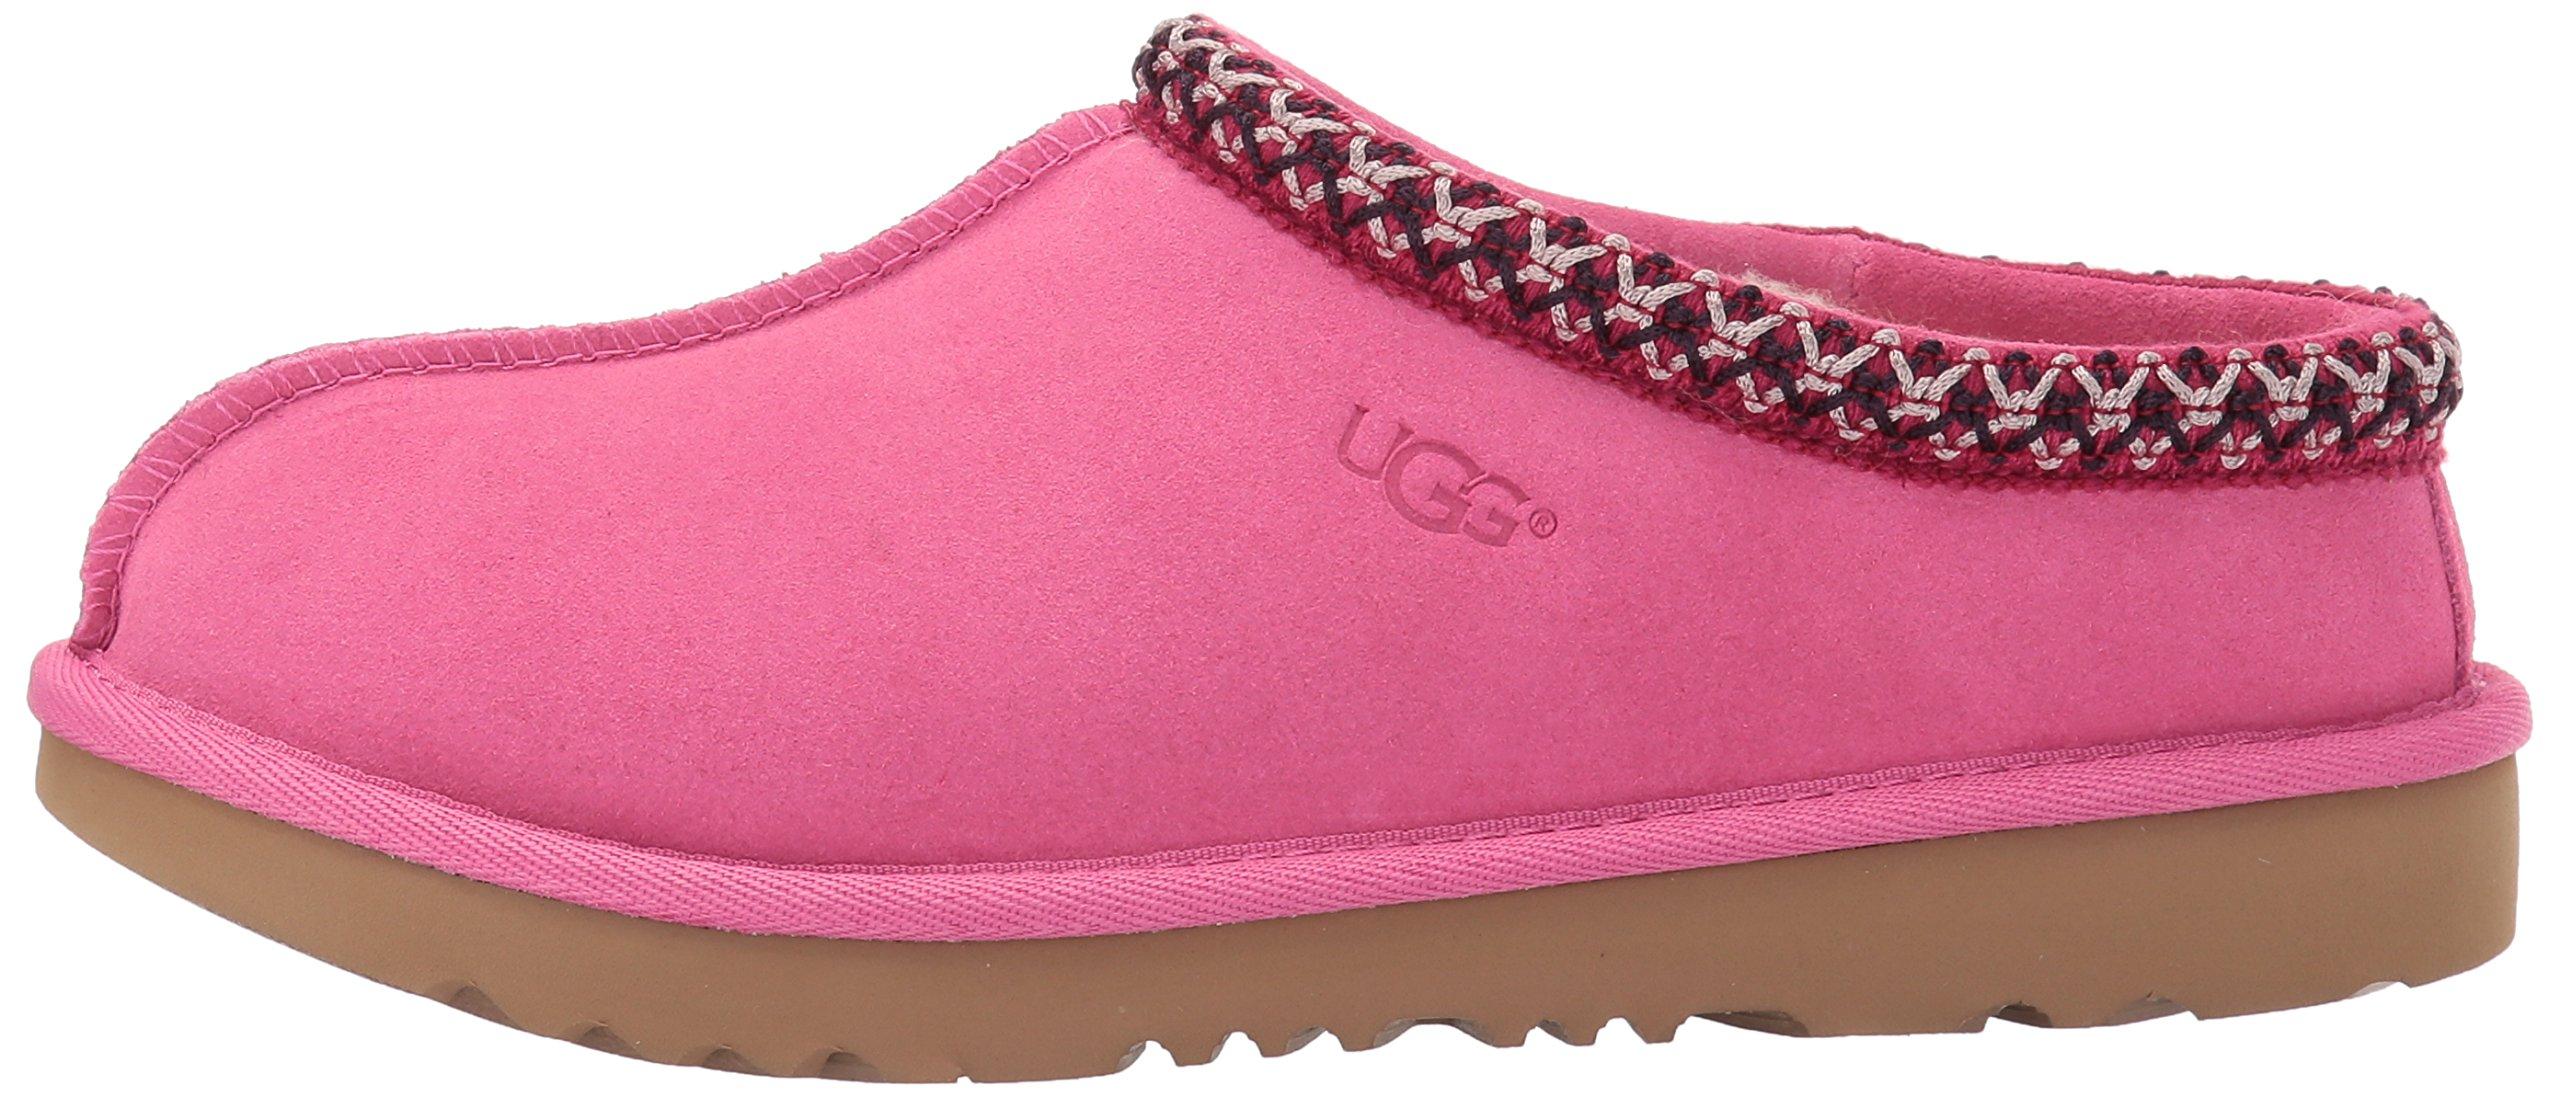 UGG Kids K Tasman II Moccasin,Pink Azalea,2 M US Little Kid by UGG (Image #5)